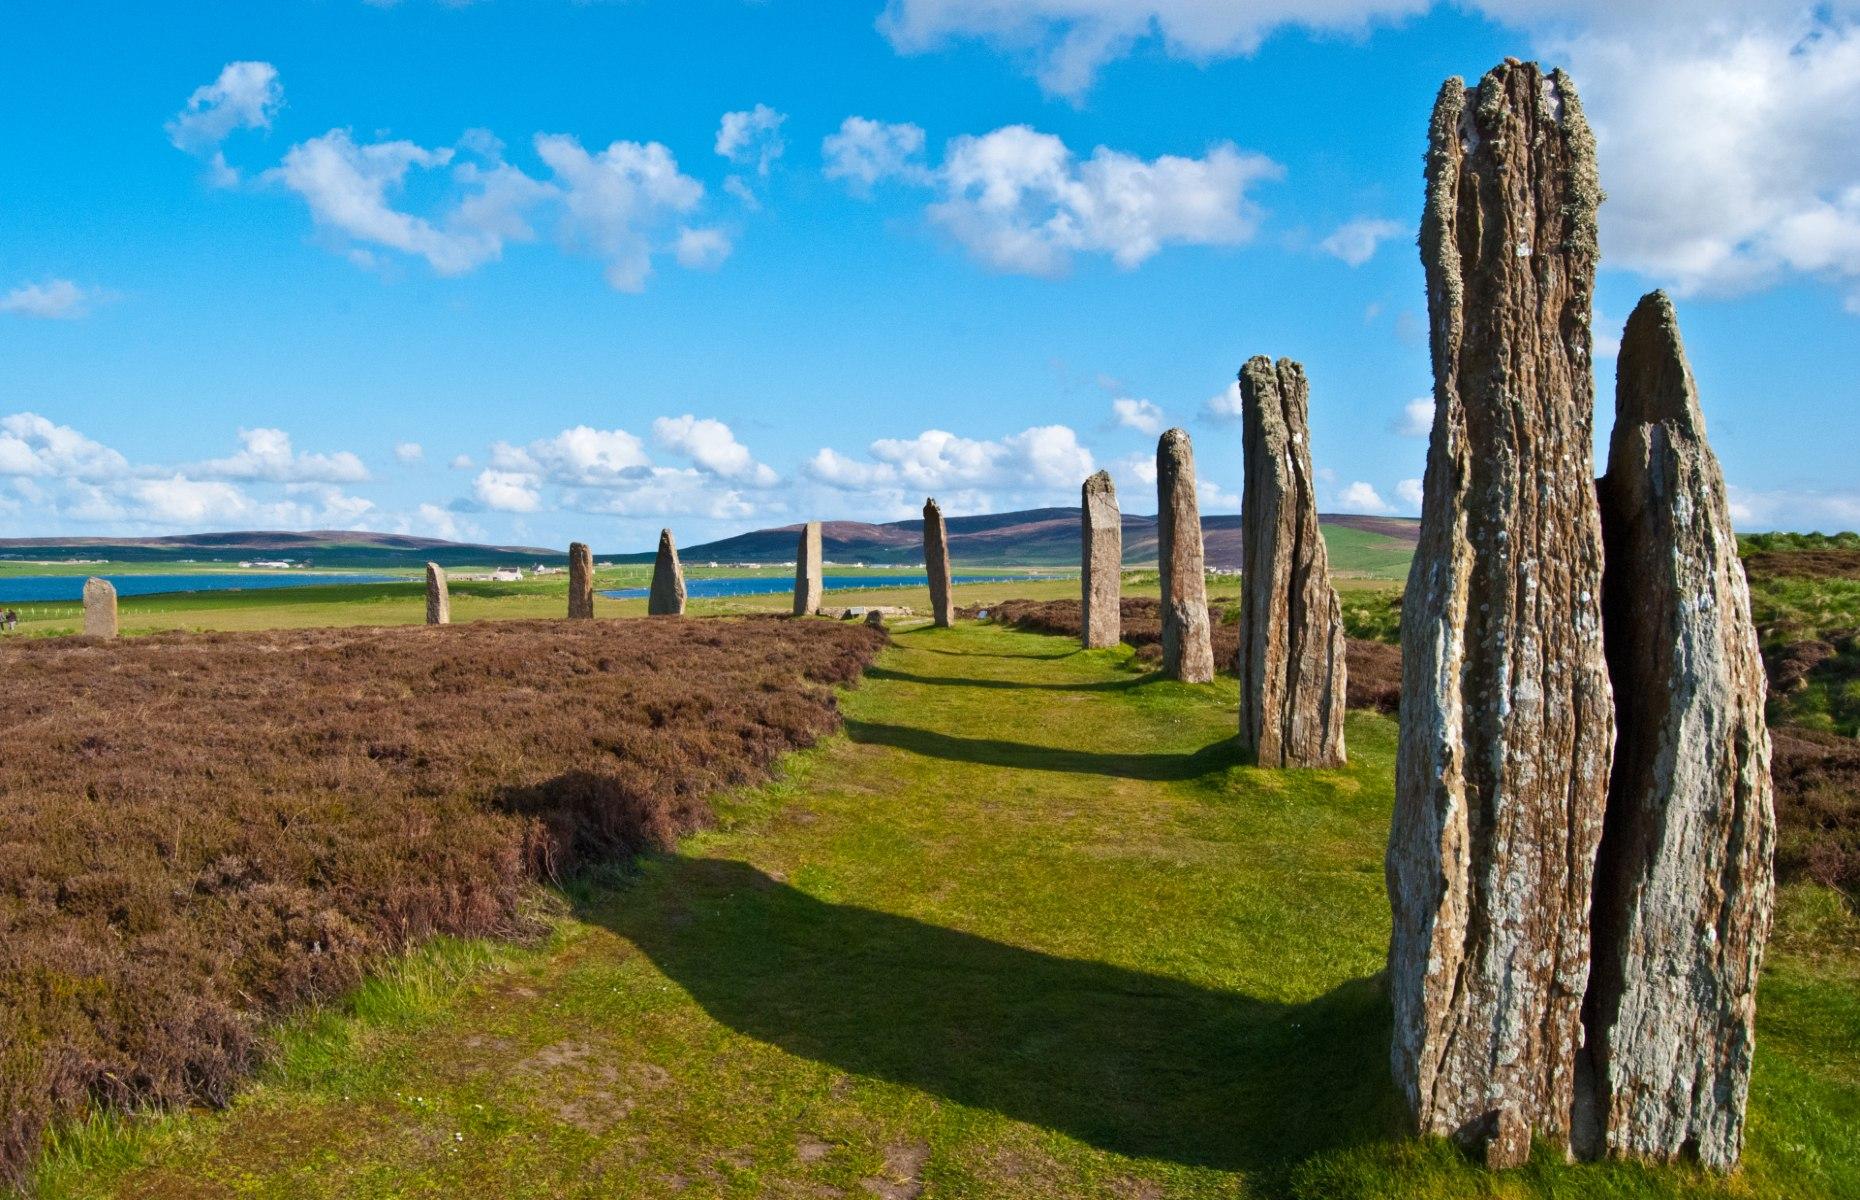 Ring of Brodgar in Orkney (Image: Jule_Berlin/Shutterstock)